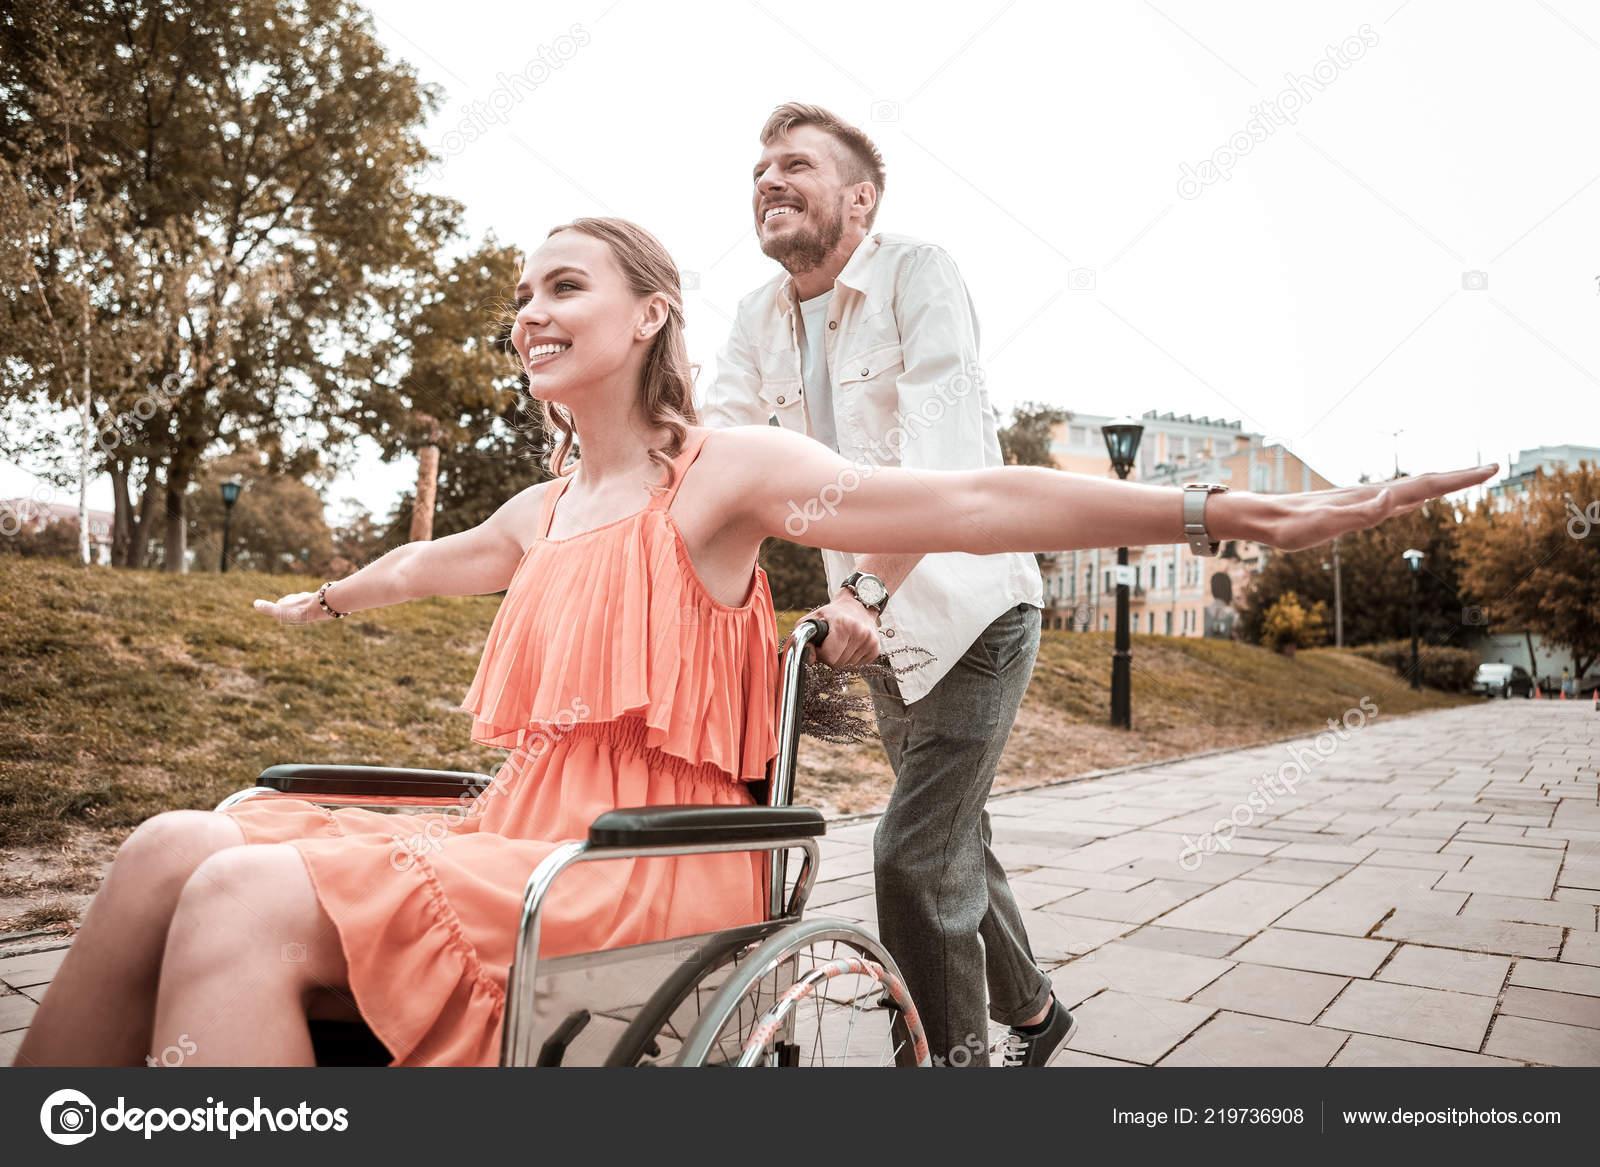 Boyfriend Exciting Her Riding